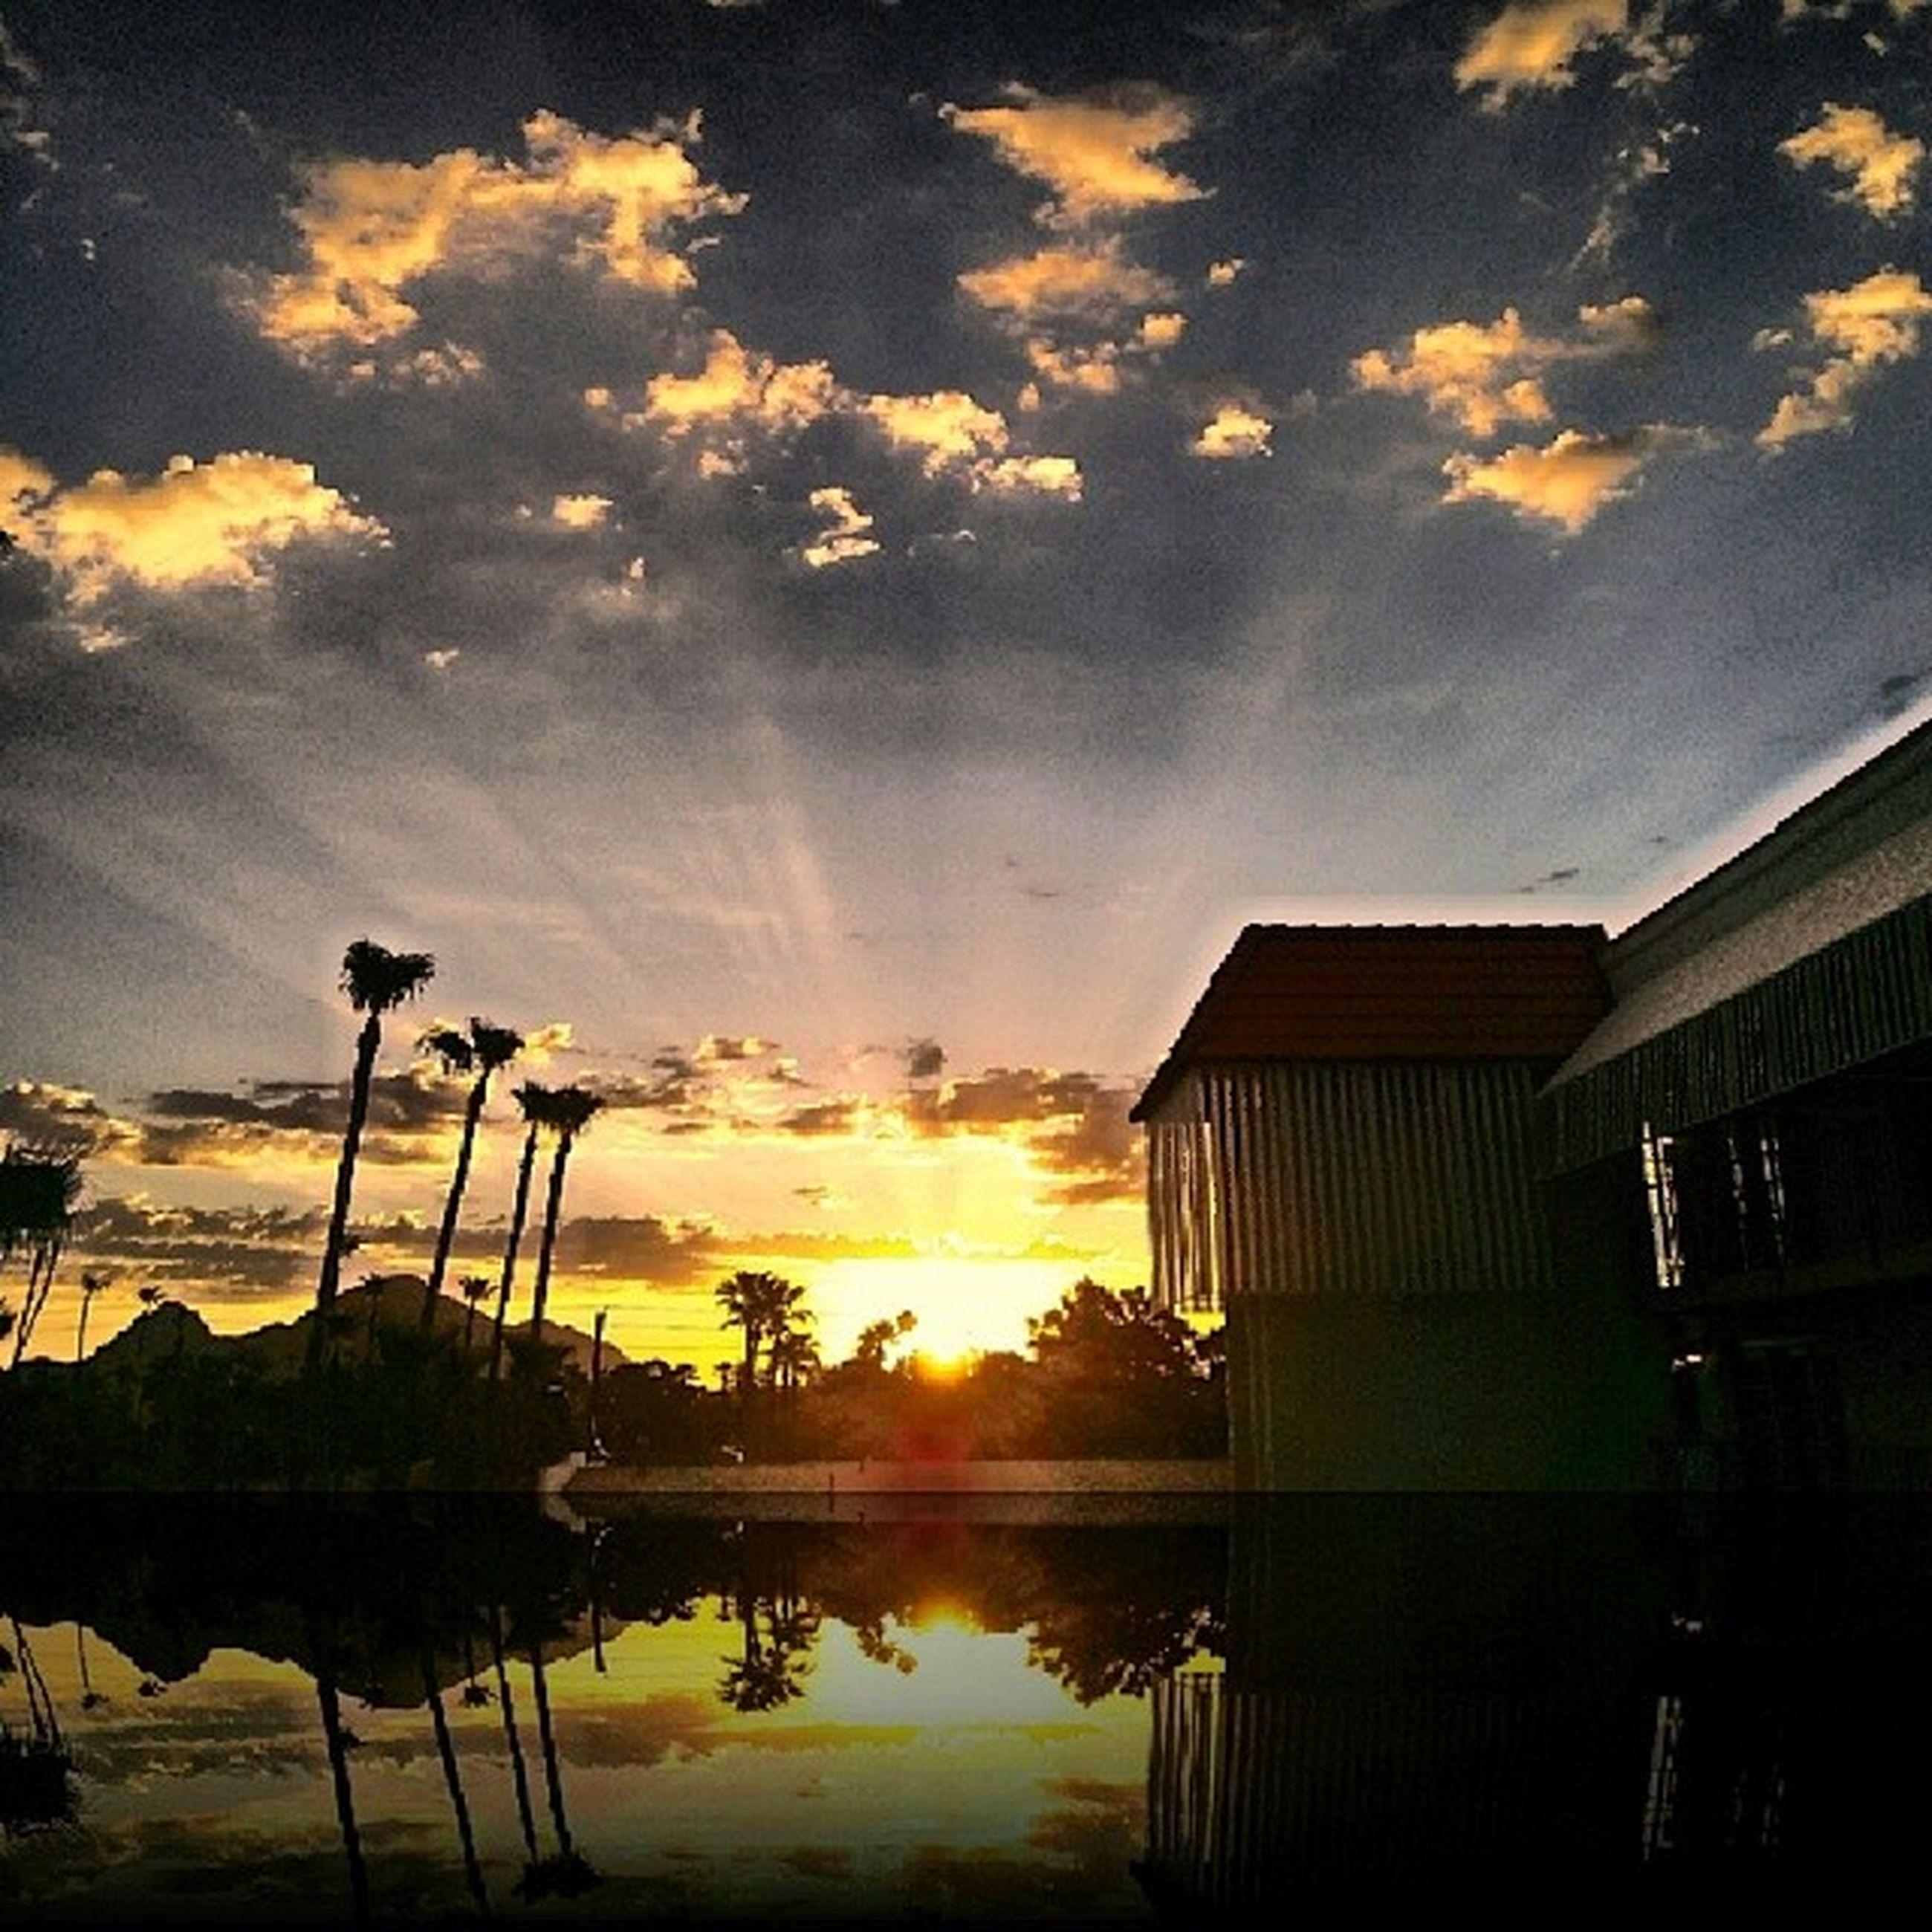 sunset, water, sky, reflection, cloud - sky, sun, orange color, scenics, beauty in nature, built structure, tranquility, architecture, nature, tranquil scene, cloud, cloudy, idyllic, sunlight, sea, building exterior